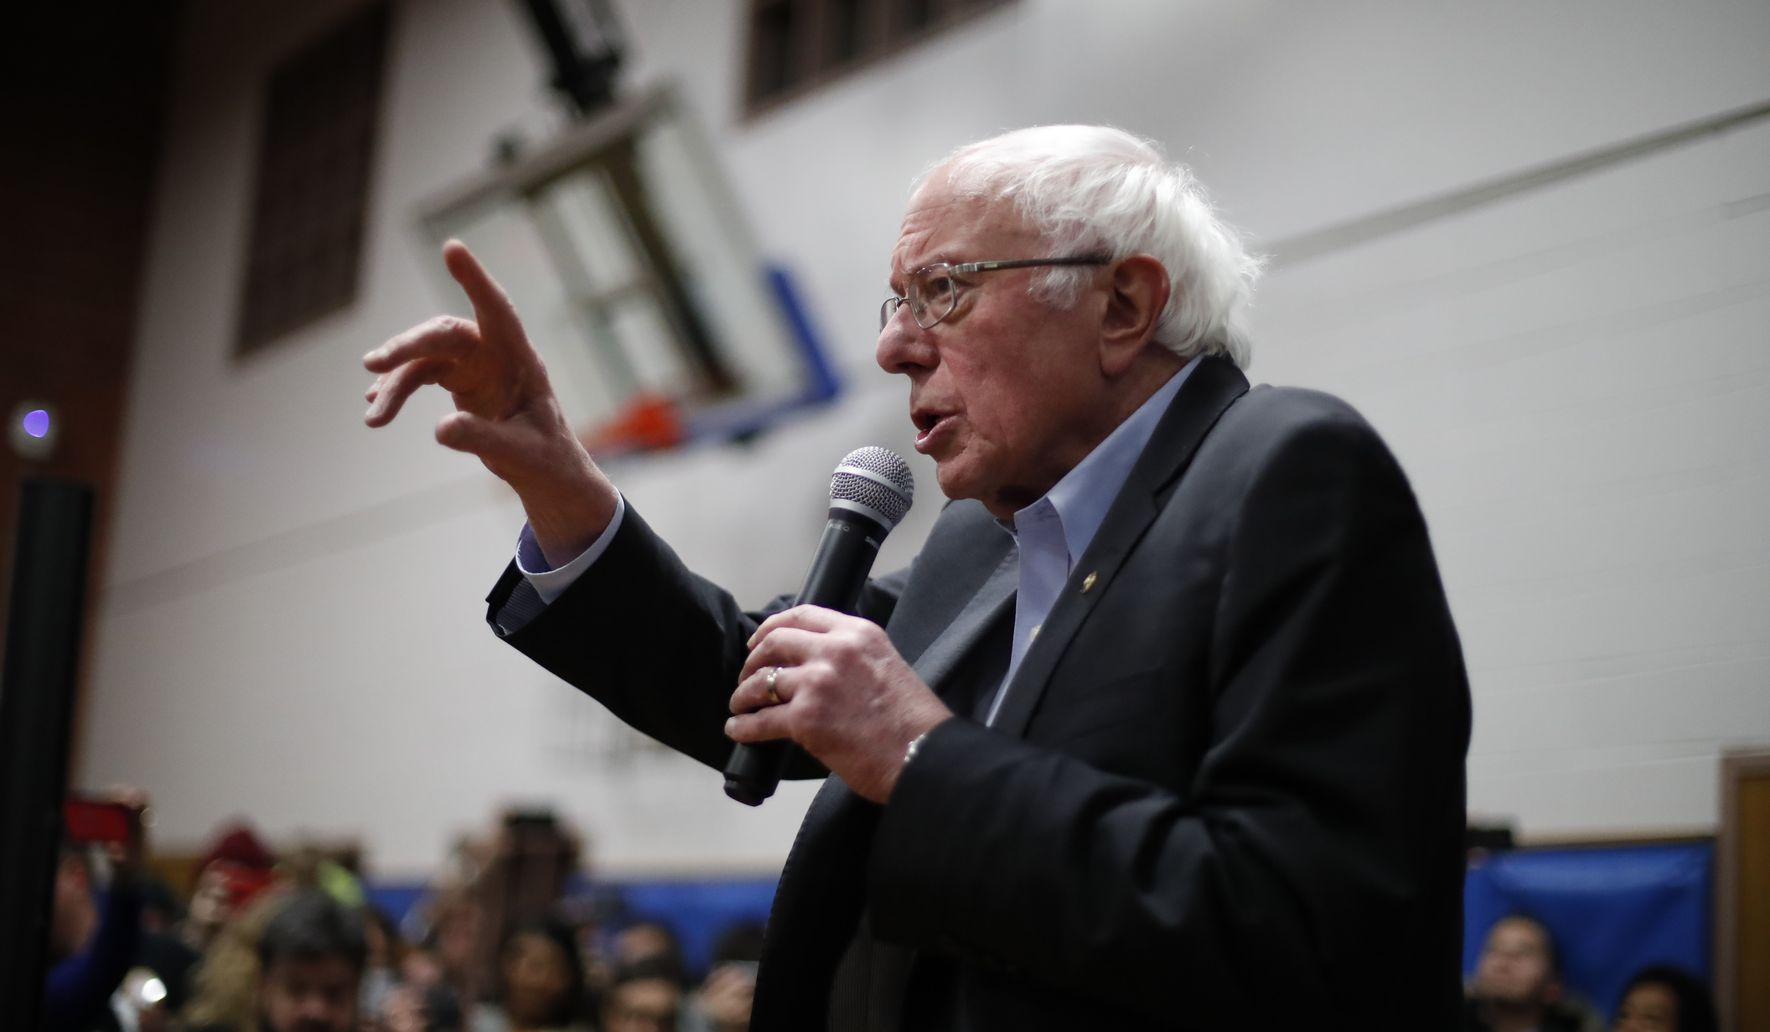 Bernie Sanders has 9-point lead in New Hampshire: CNN poll